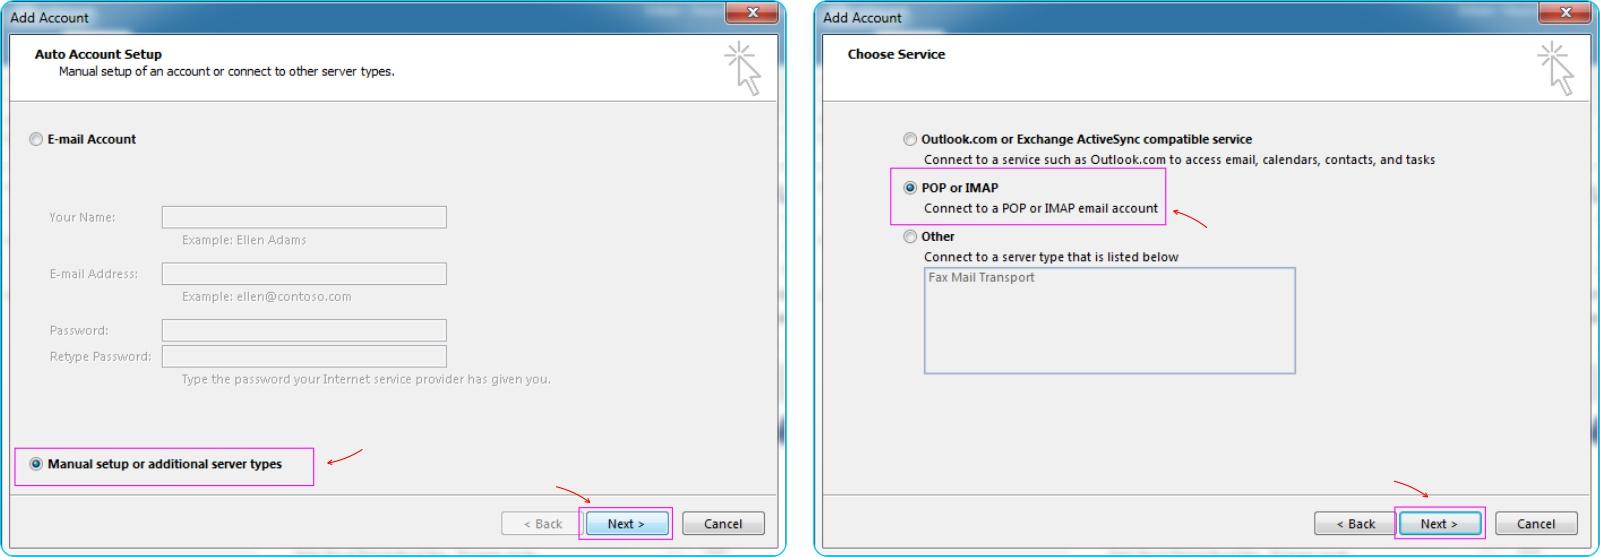 GMail Pada Outlook - Pilih Jenis Protokol Email